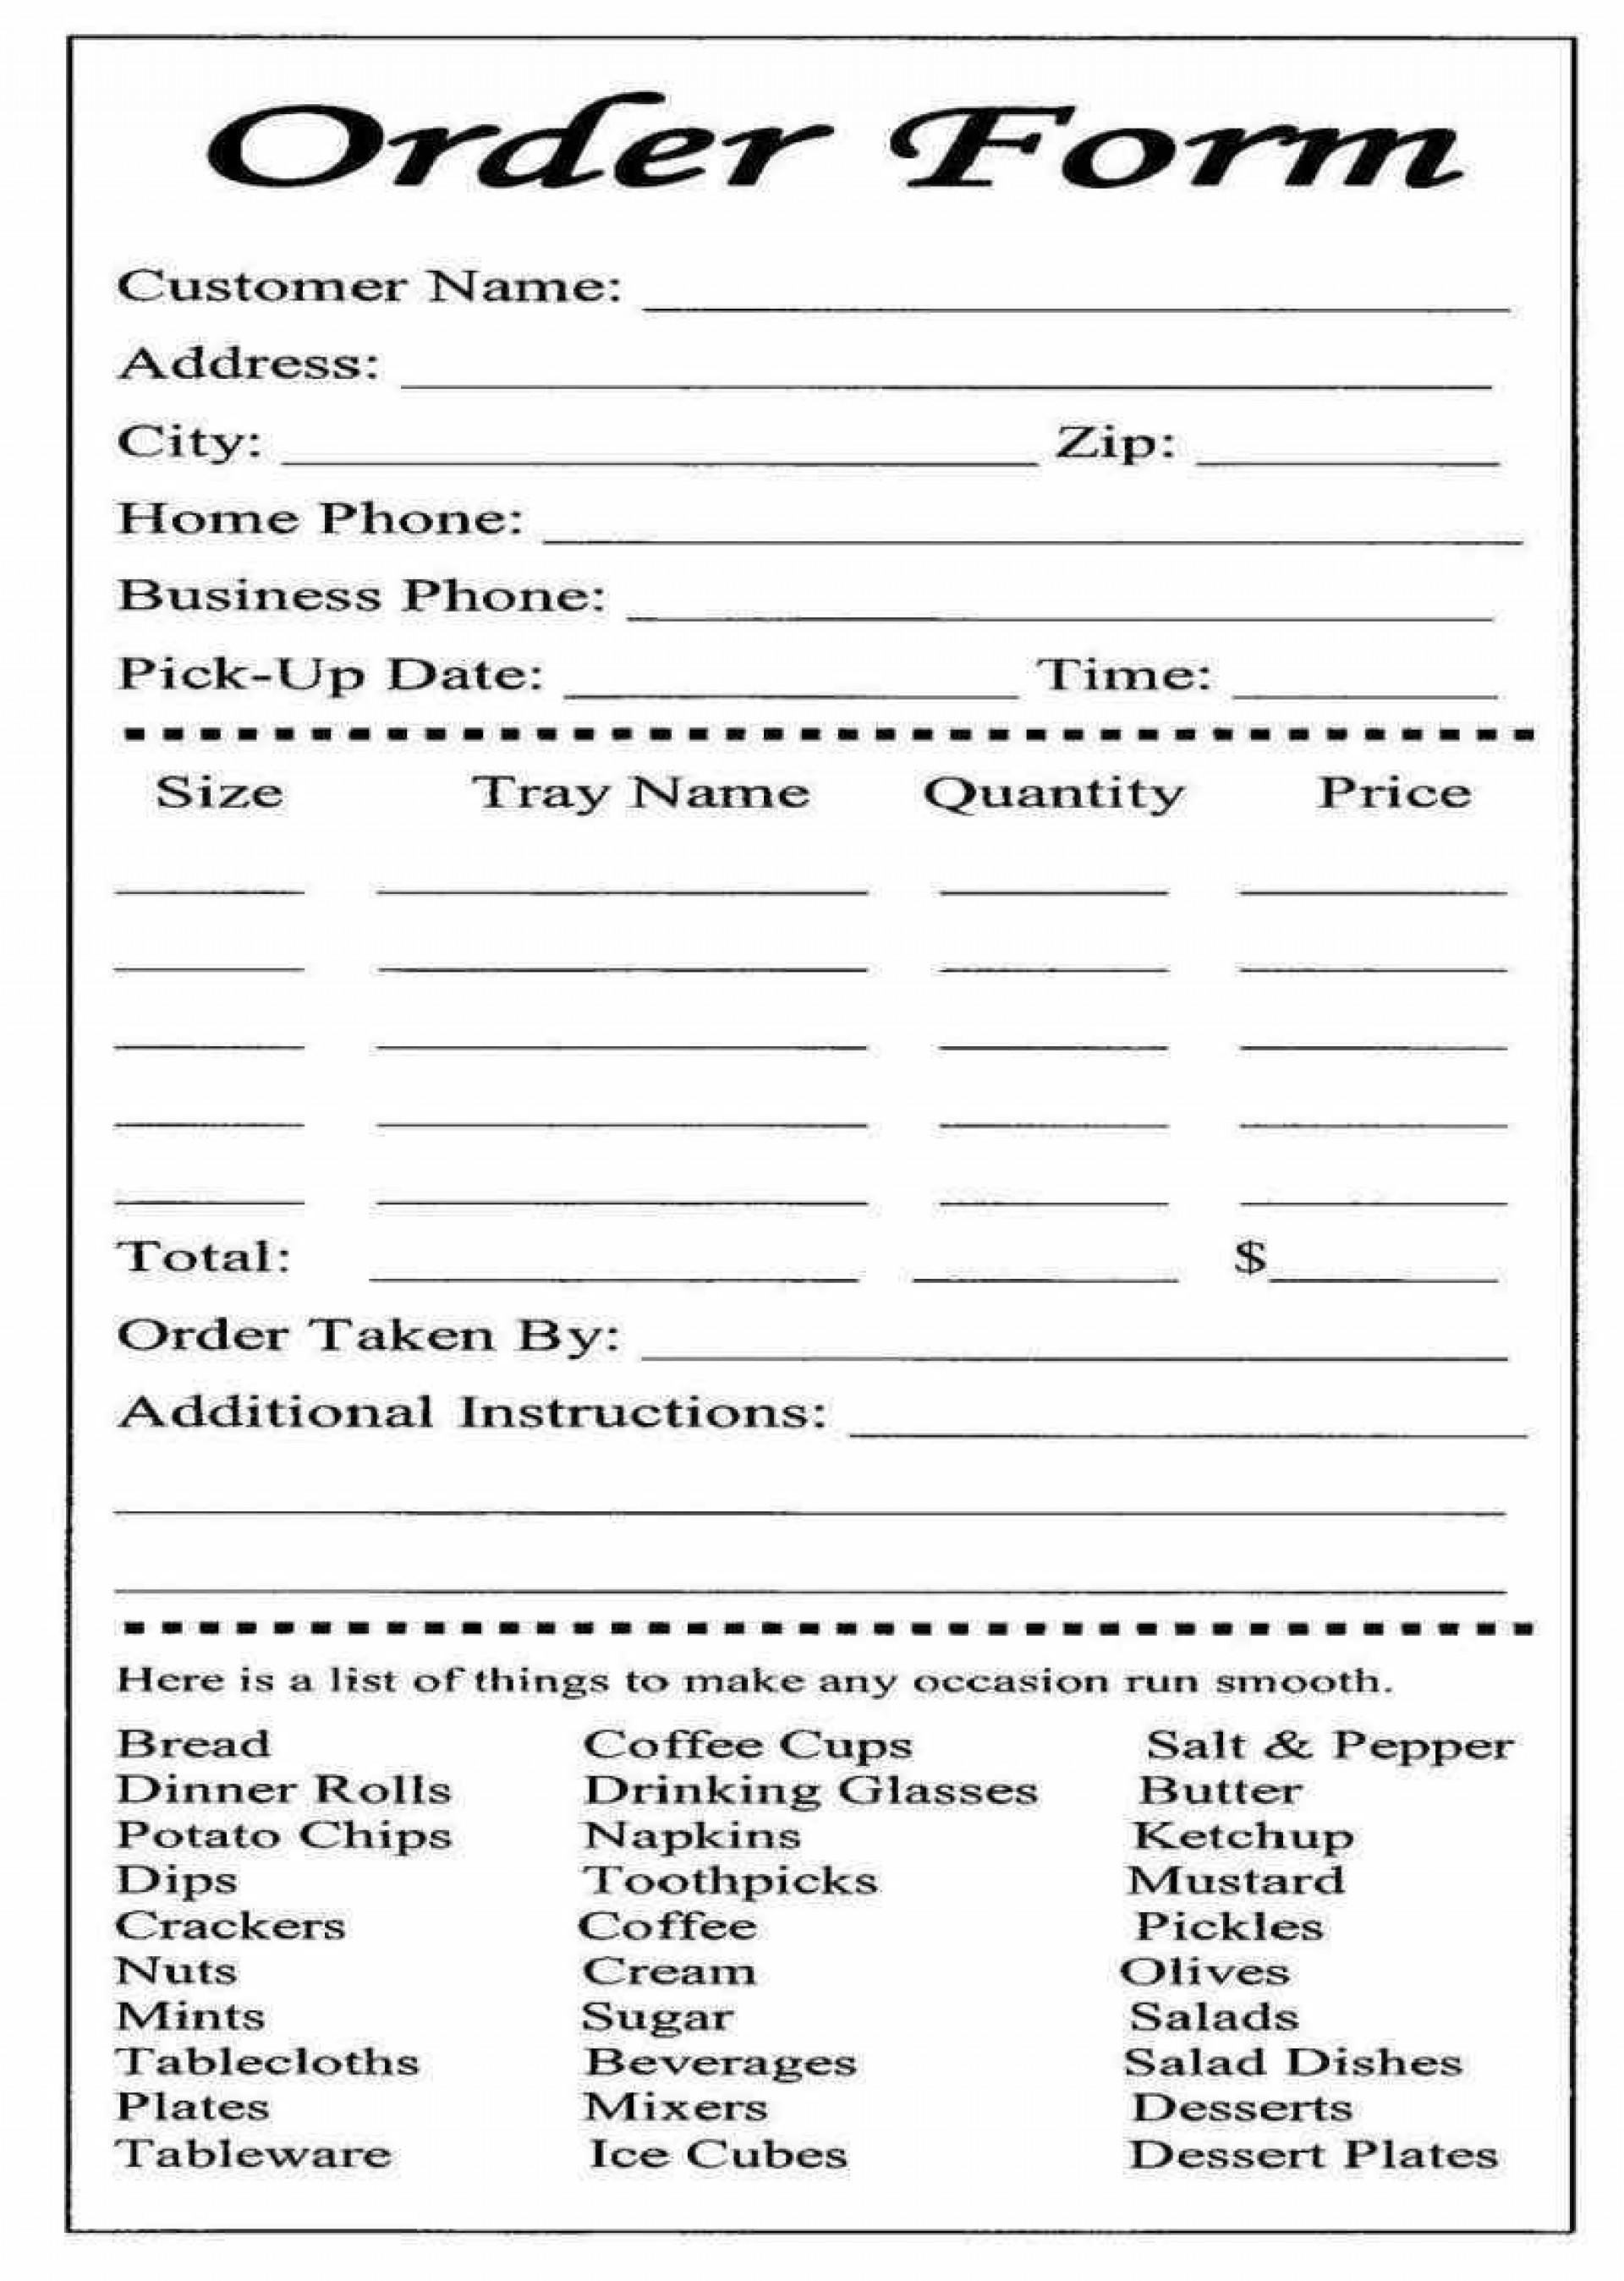 004 Wonderful Food Order Form Template Word Design 1920